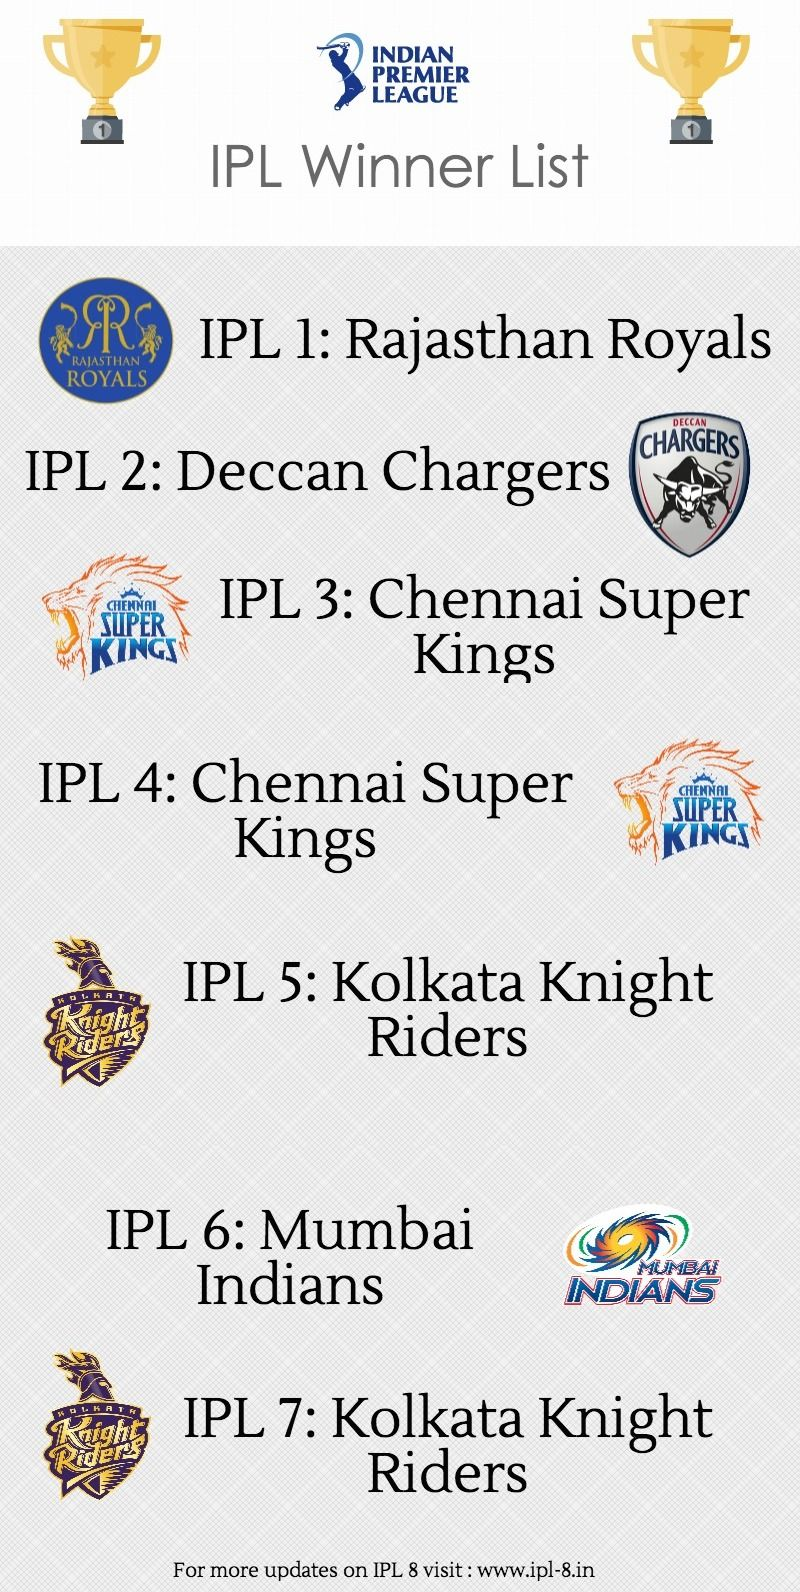 IPL Winners wallpapers